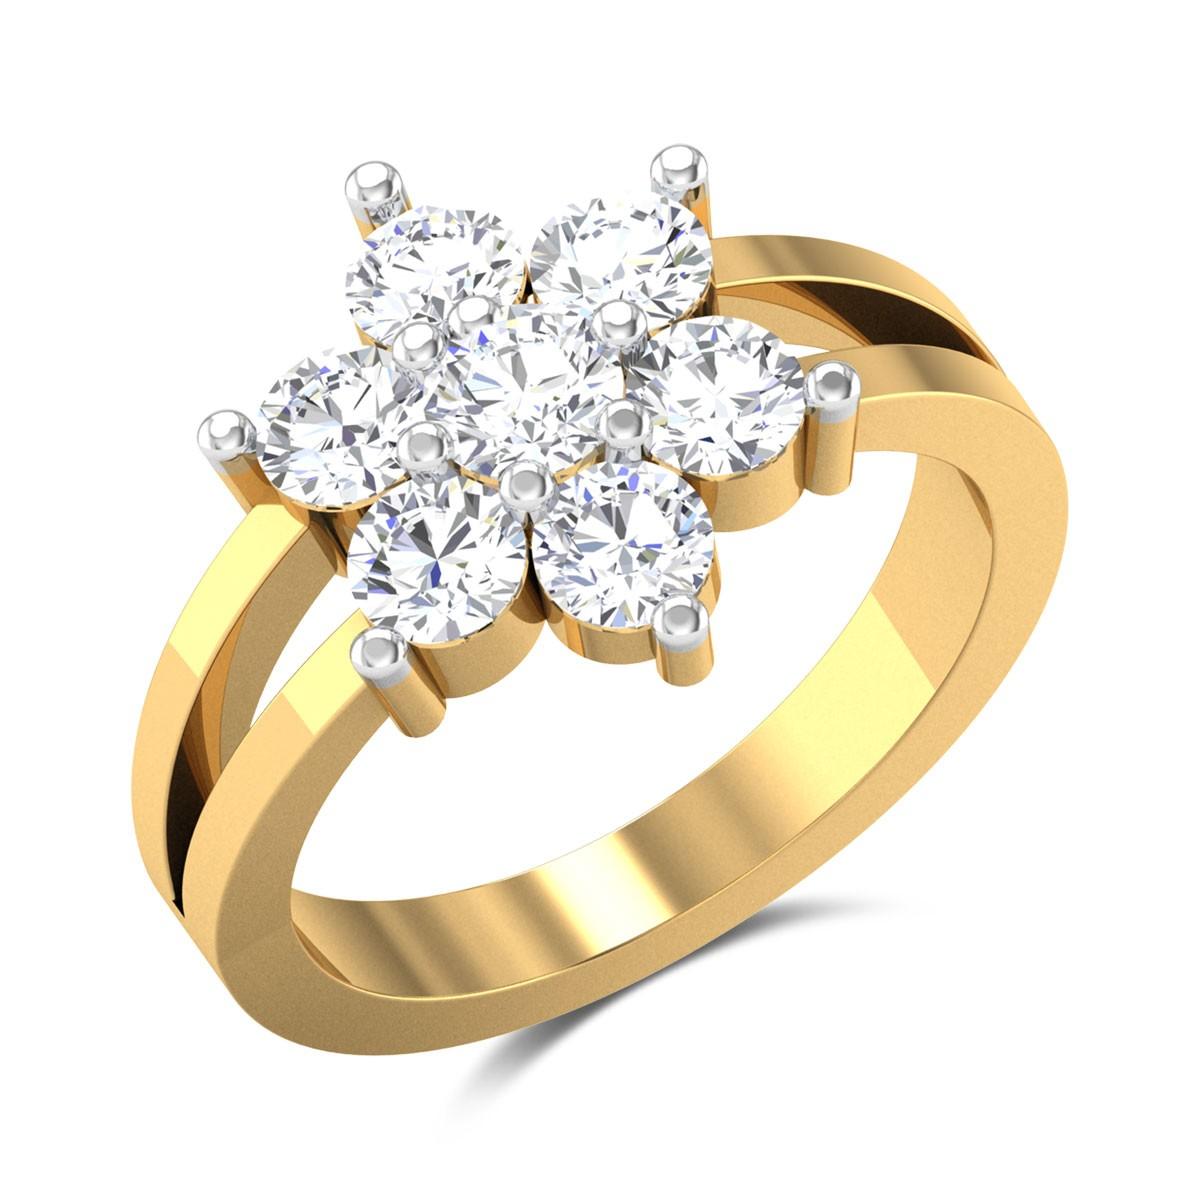 Dangelo Floral Split Band Solitaire Ring